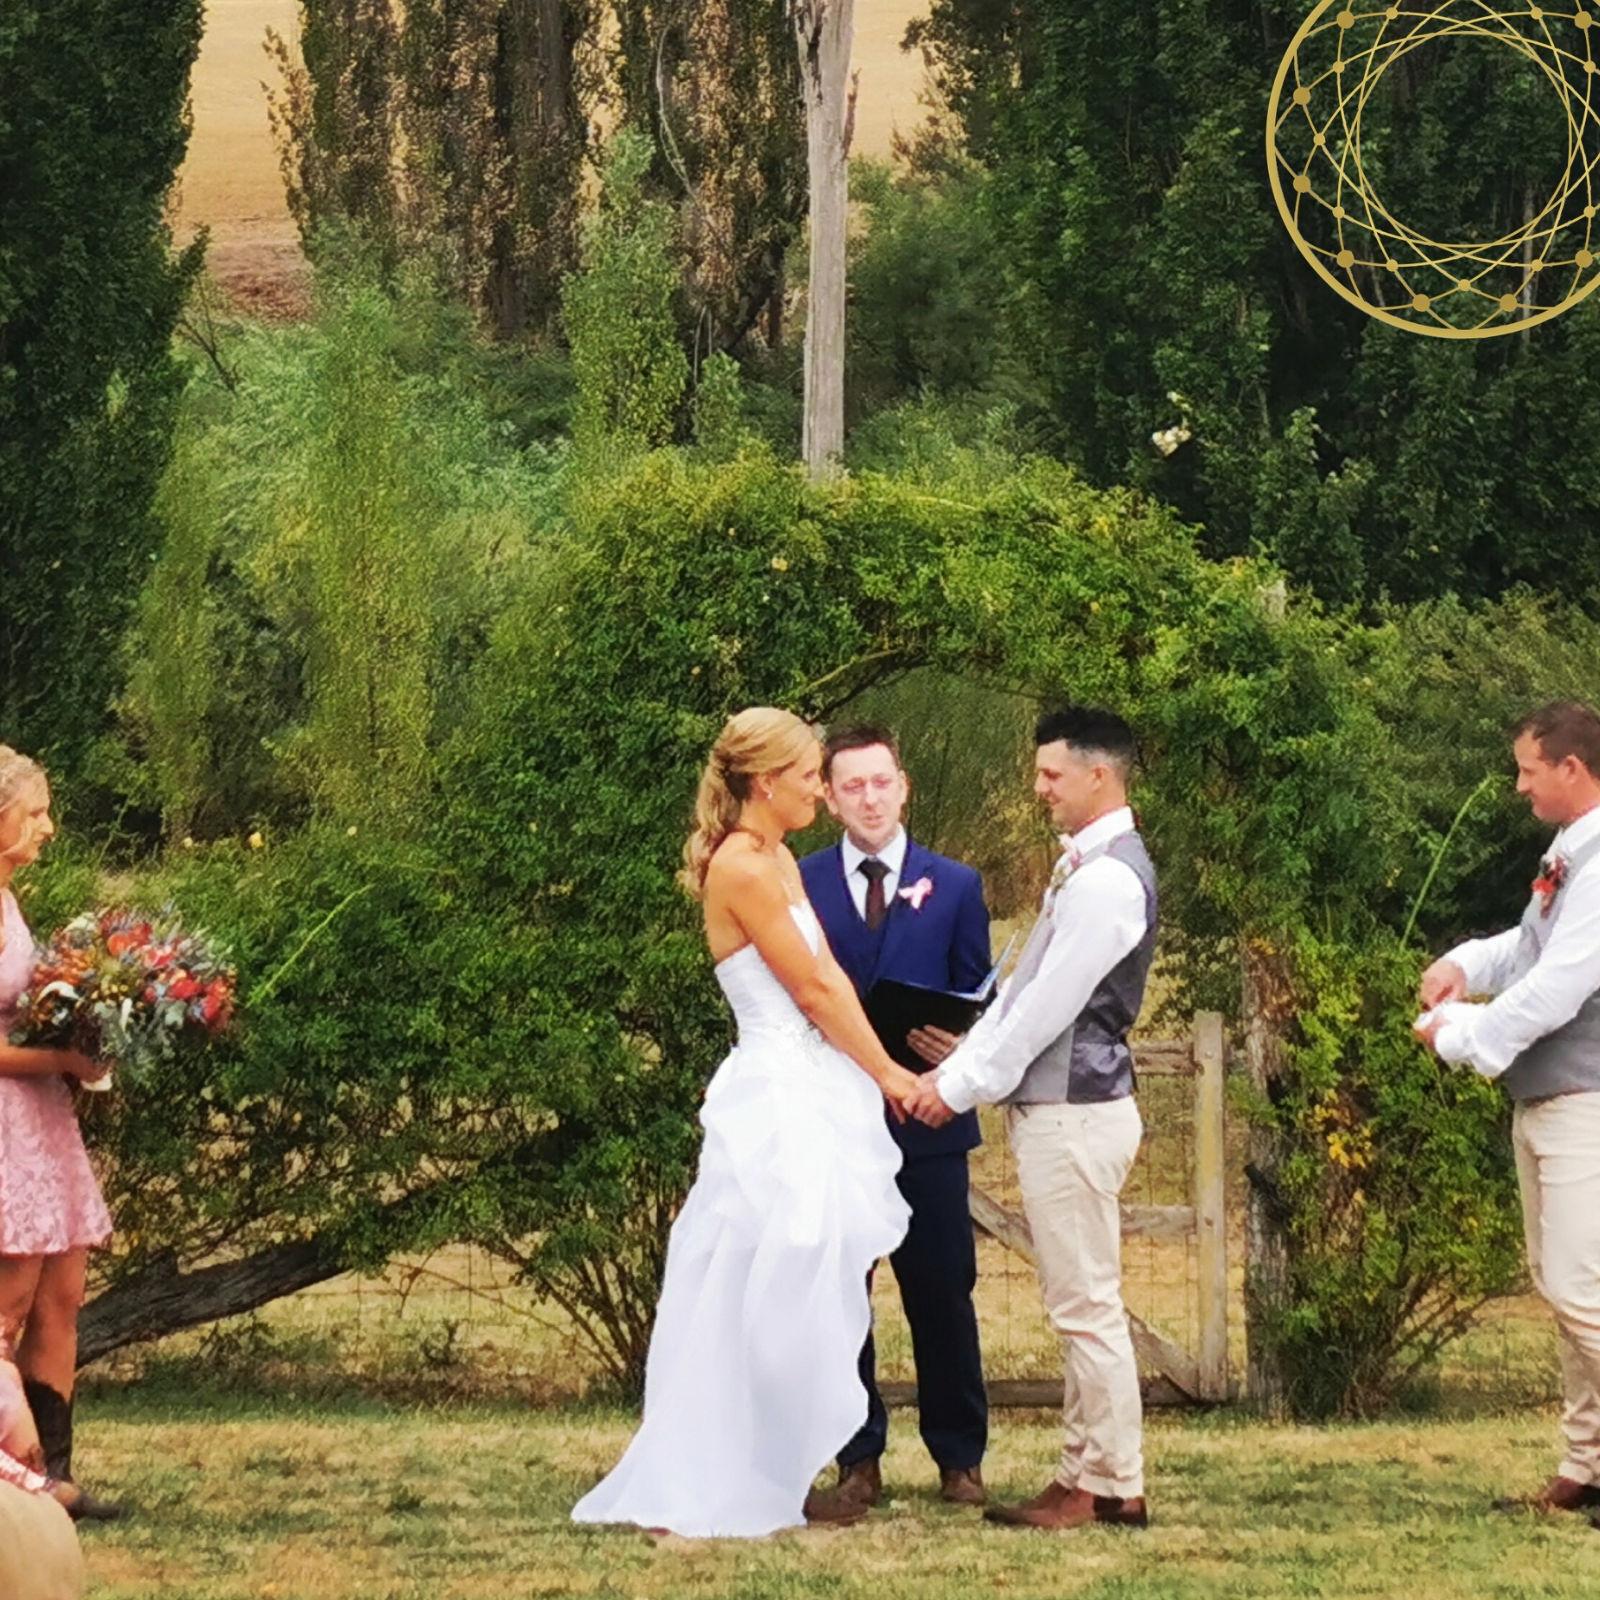 Outdoor Wedding, Rustic Wedding Ceremony, Male Celebrant Sydney, Sydney Celebrant, Fun Ceremony